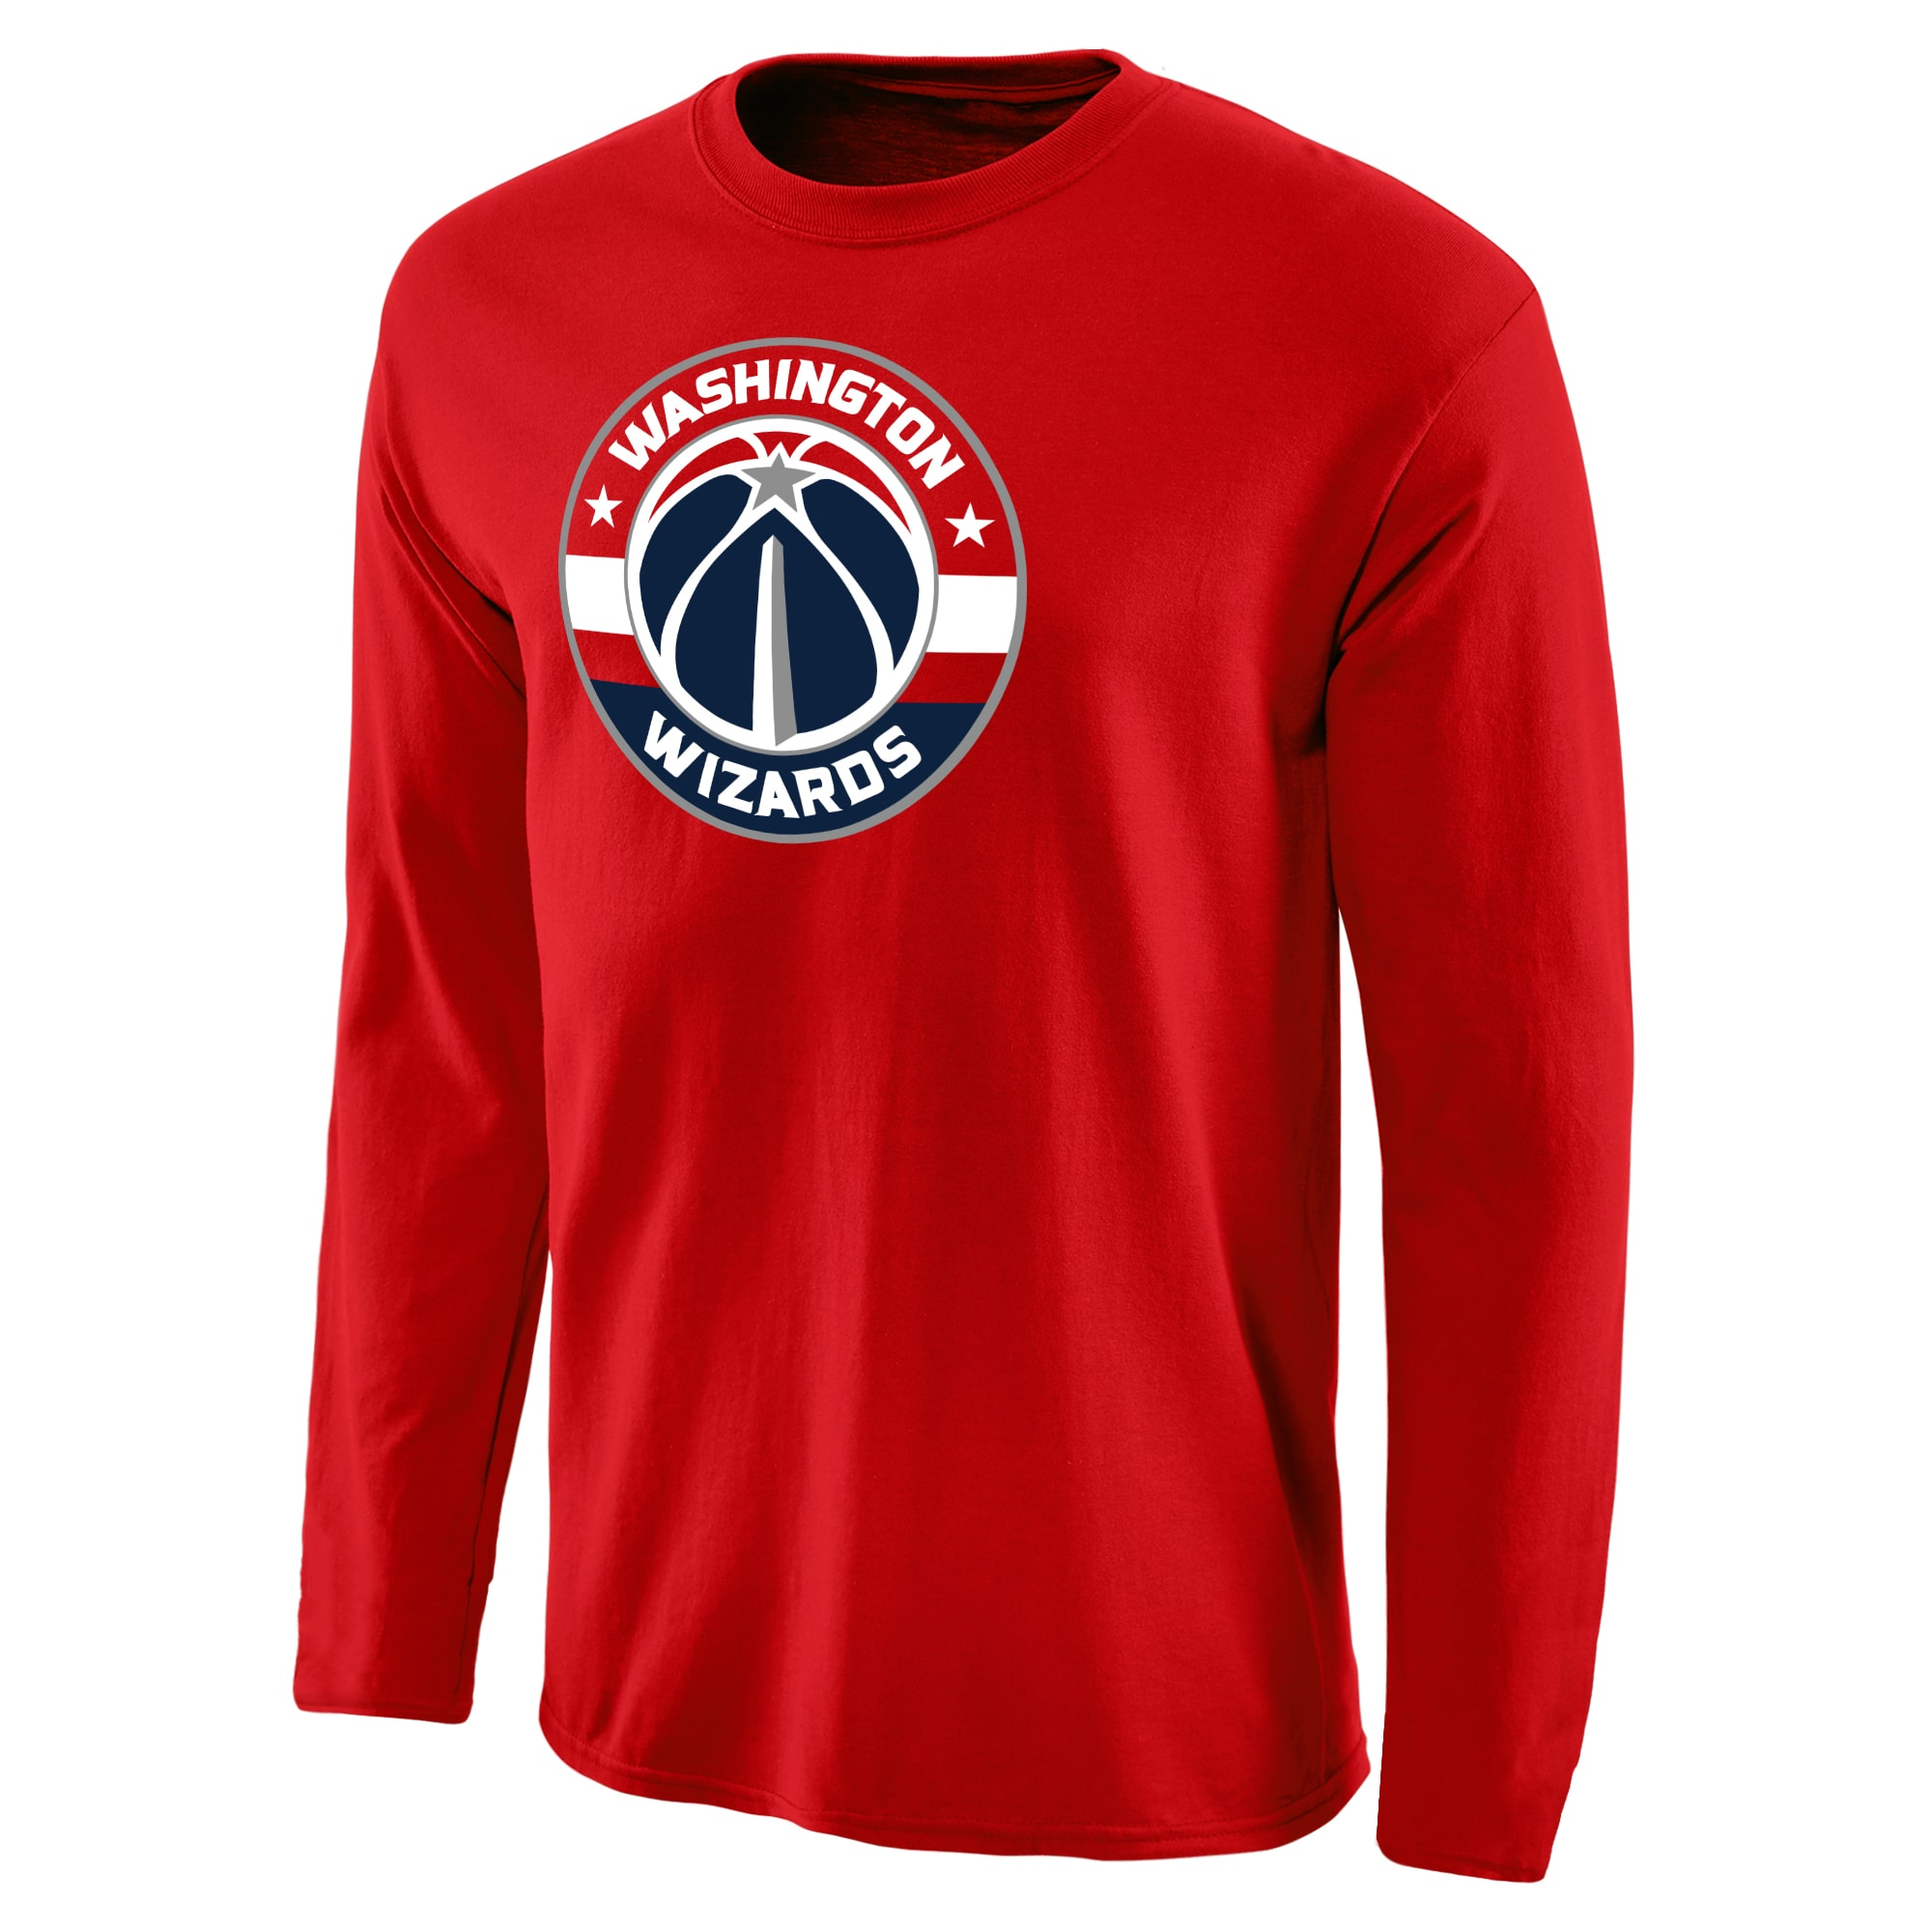 Washington Wizards Primary Logo Long Sleeve T-Shirt - Red